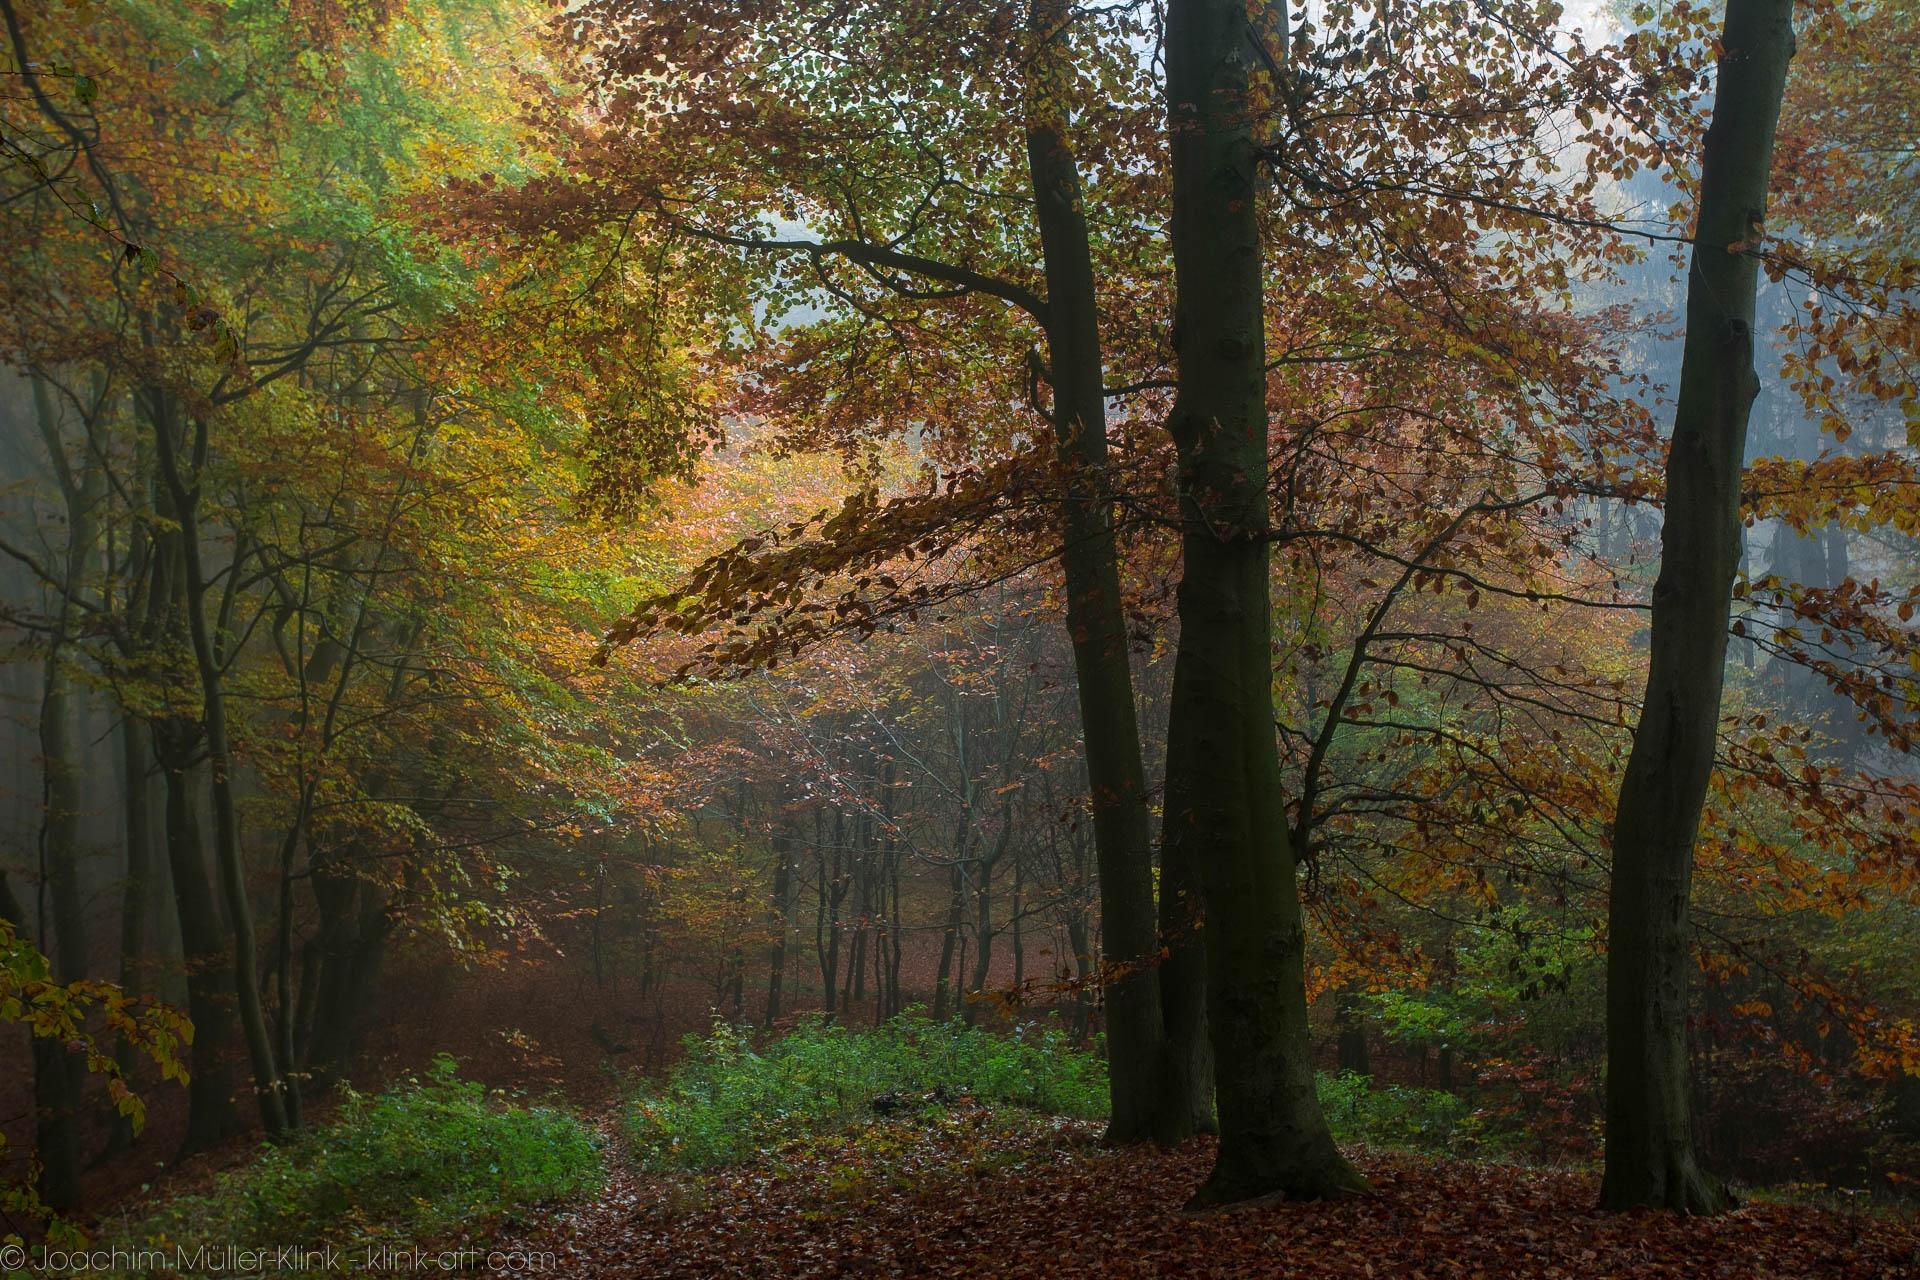 Buchen im Herbstwald - Bleech trees in autumn forest